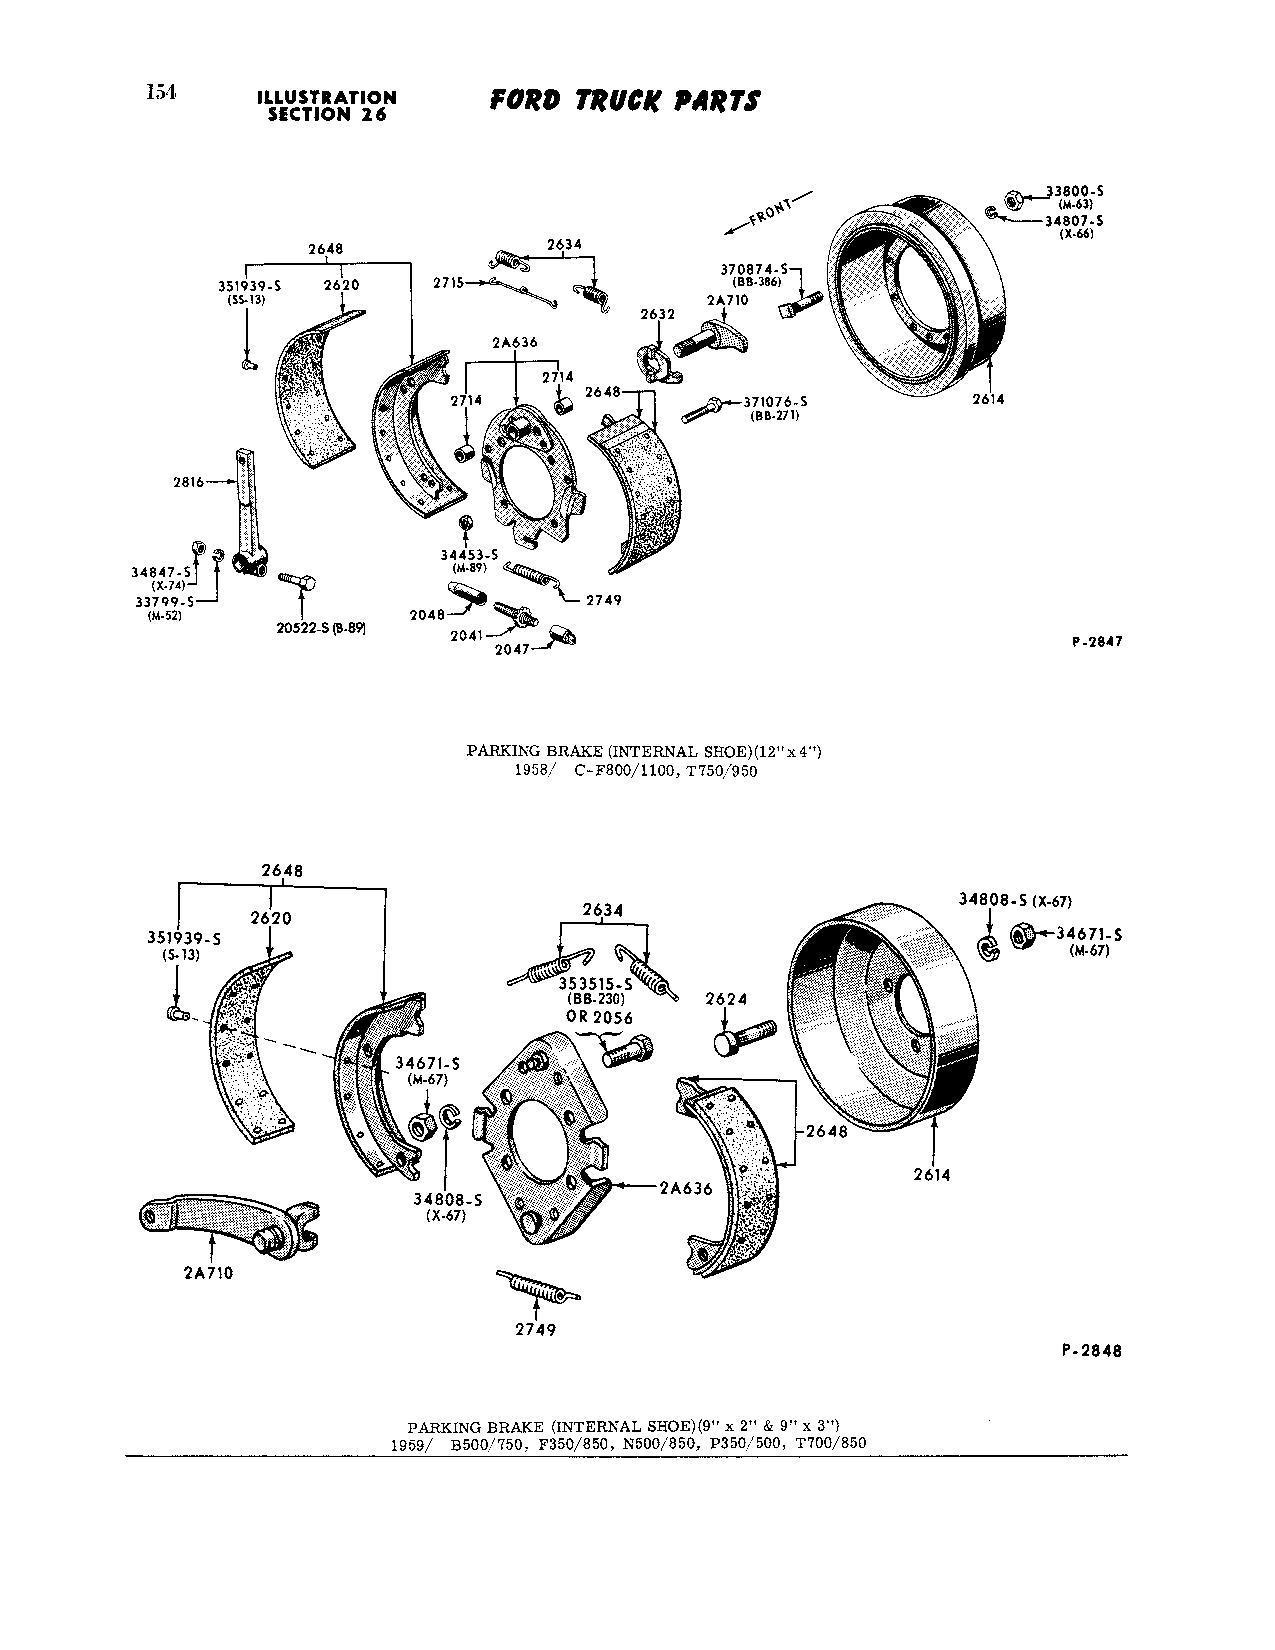 Parts Source > Parking Brake, Driveshaft-Mounted, 1963 F